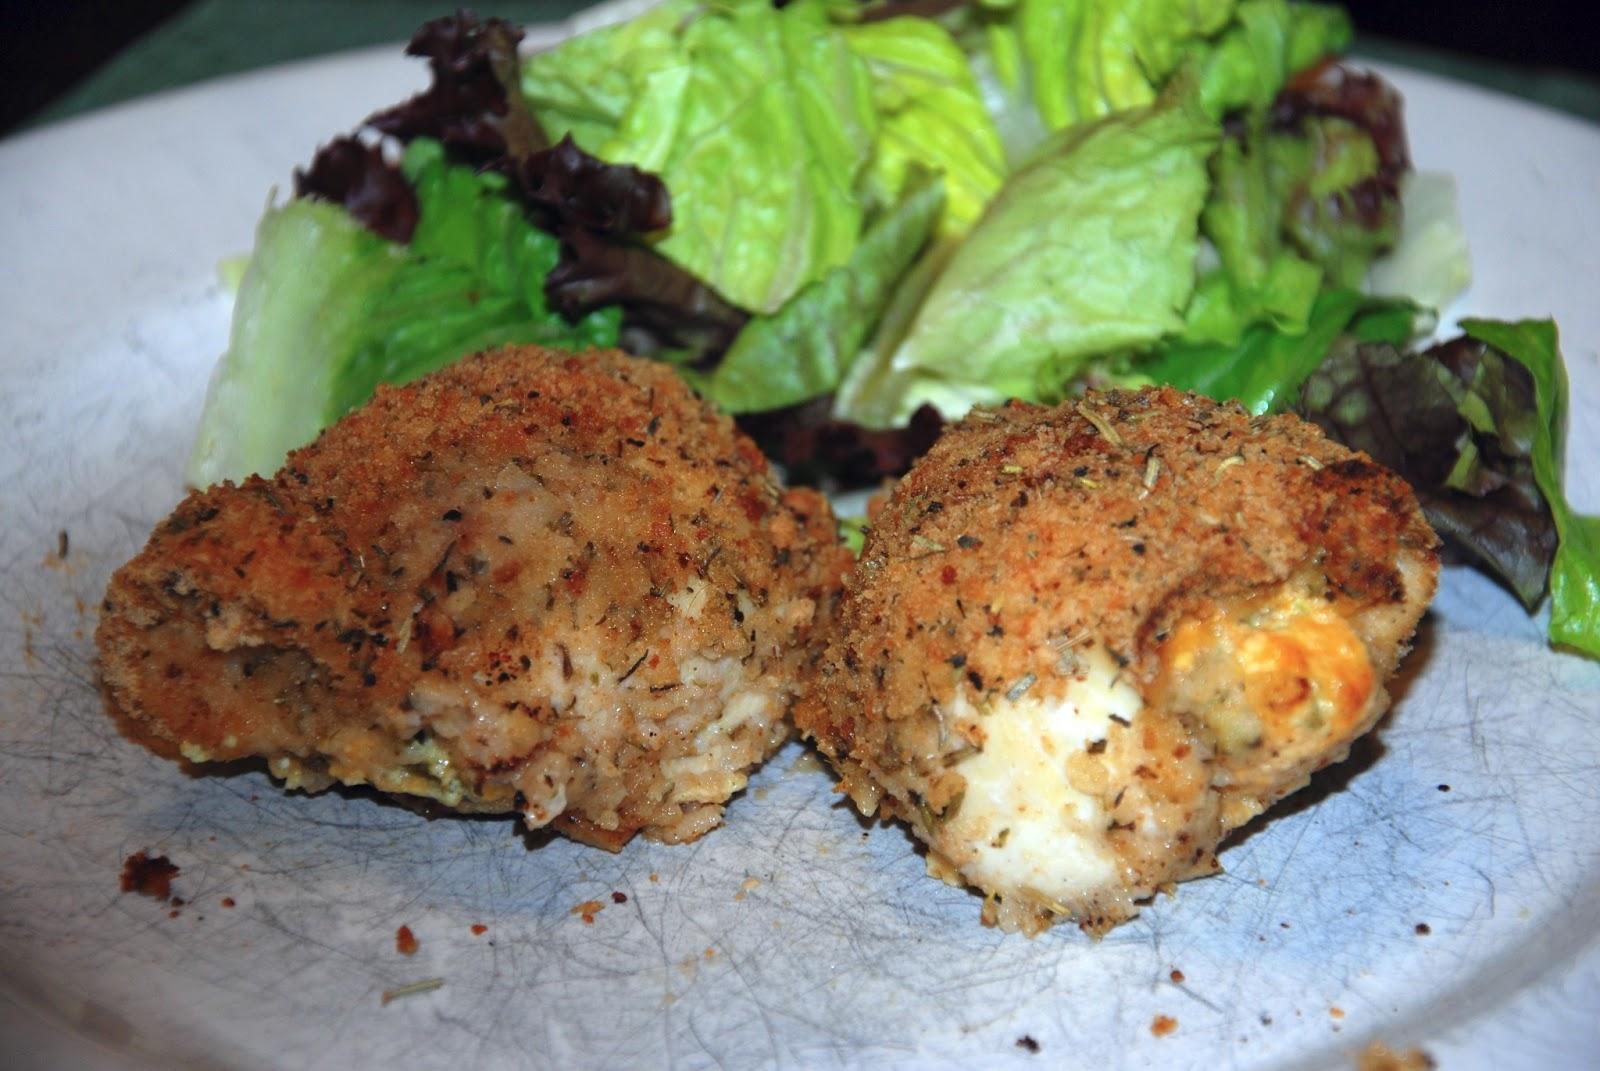 Cheesy Jalapeno Popper Baked Stuffed Chicken